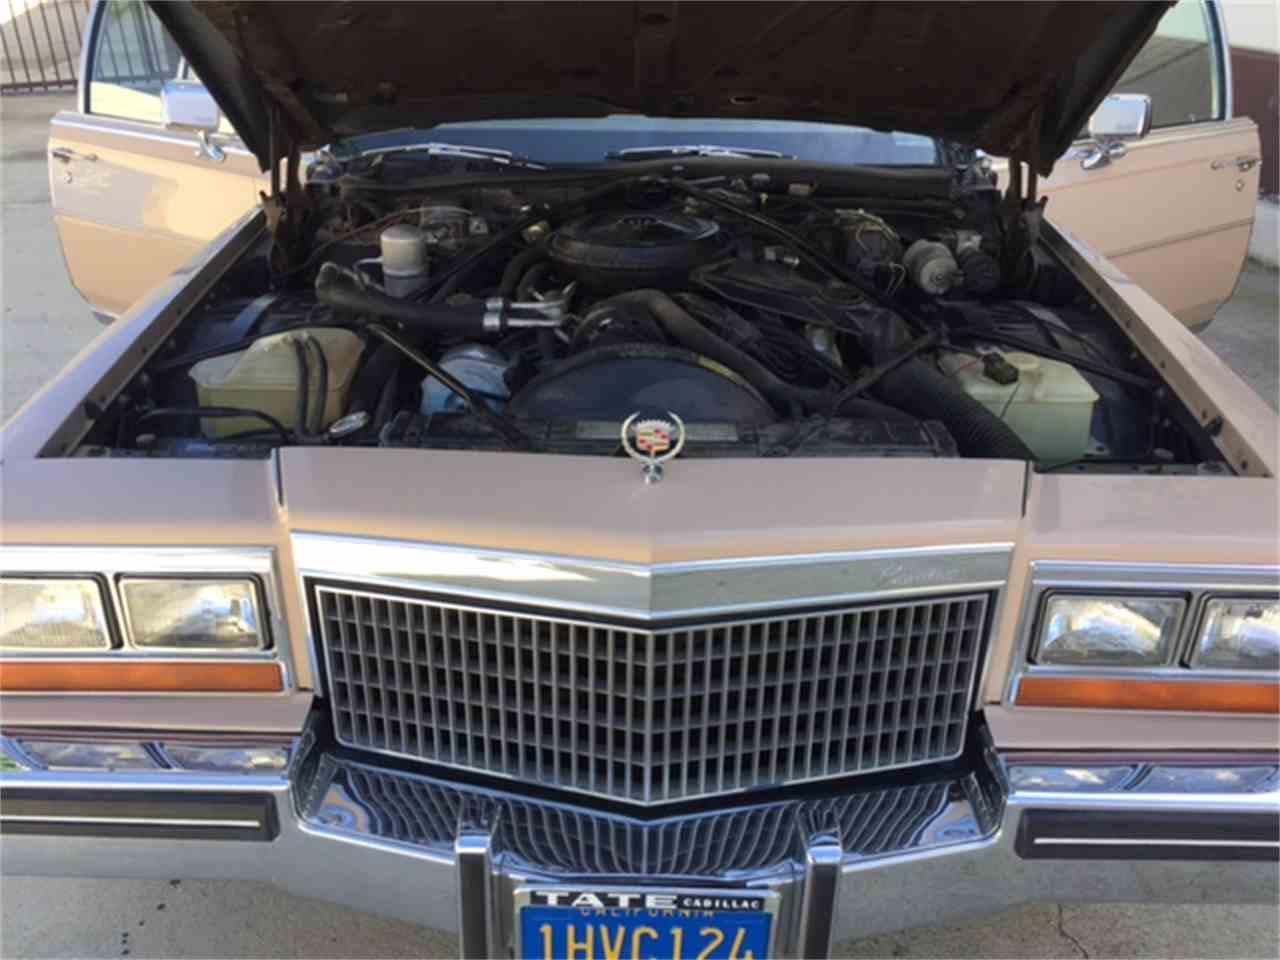 Big engine under the hood